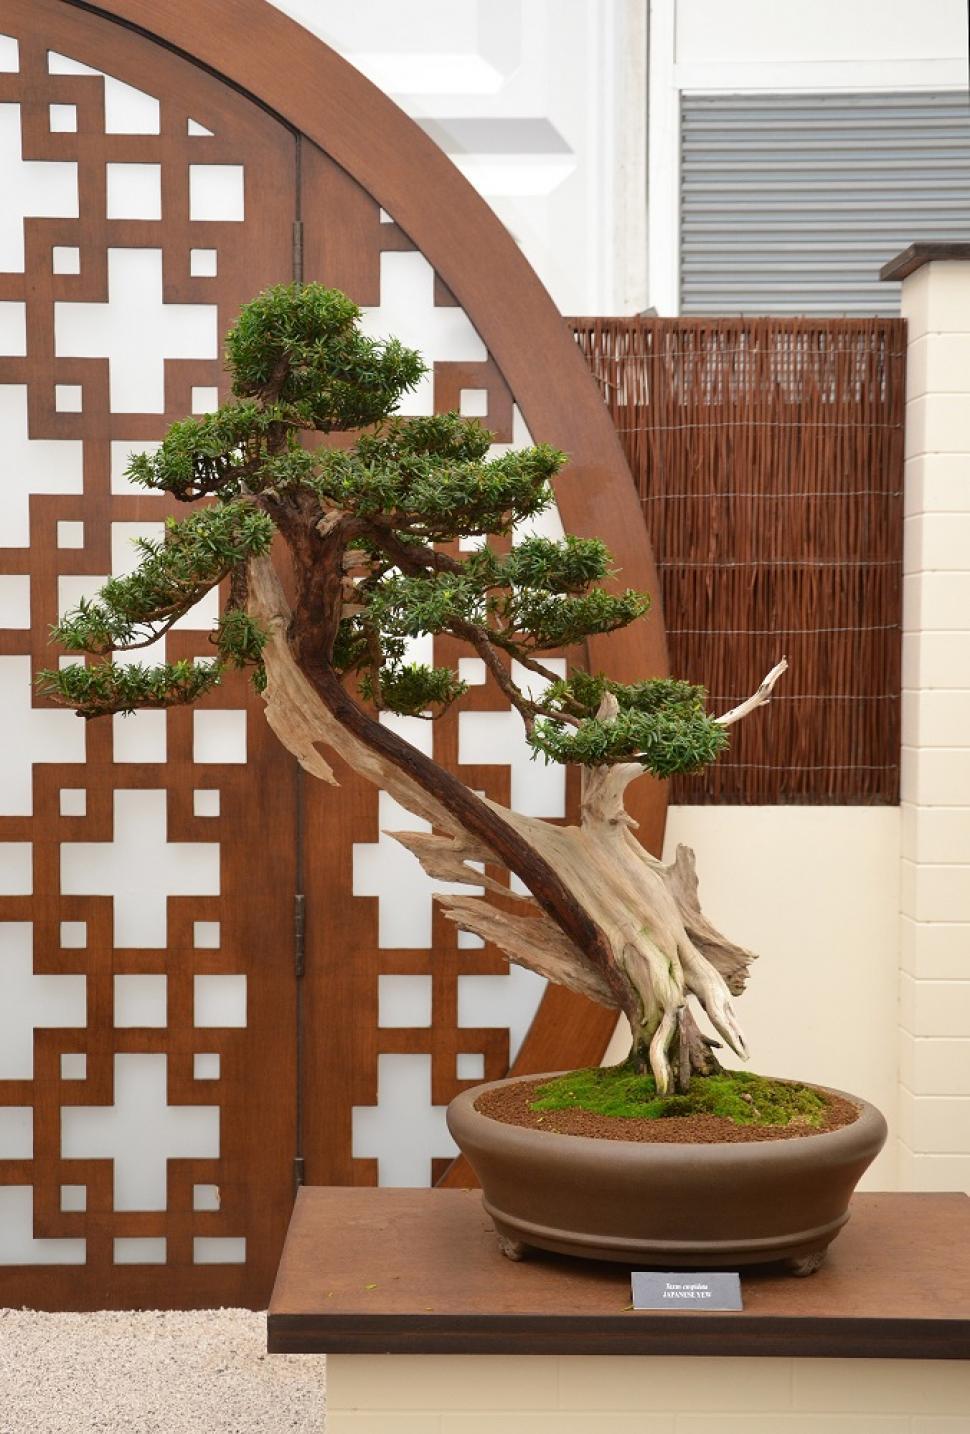 Download Free Stock HD Photo of Japanese yew bonsai Online